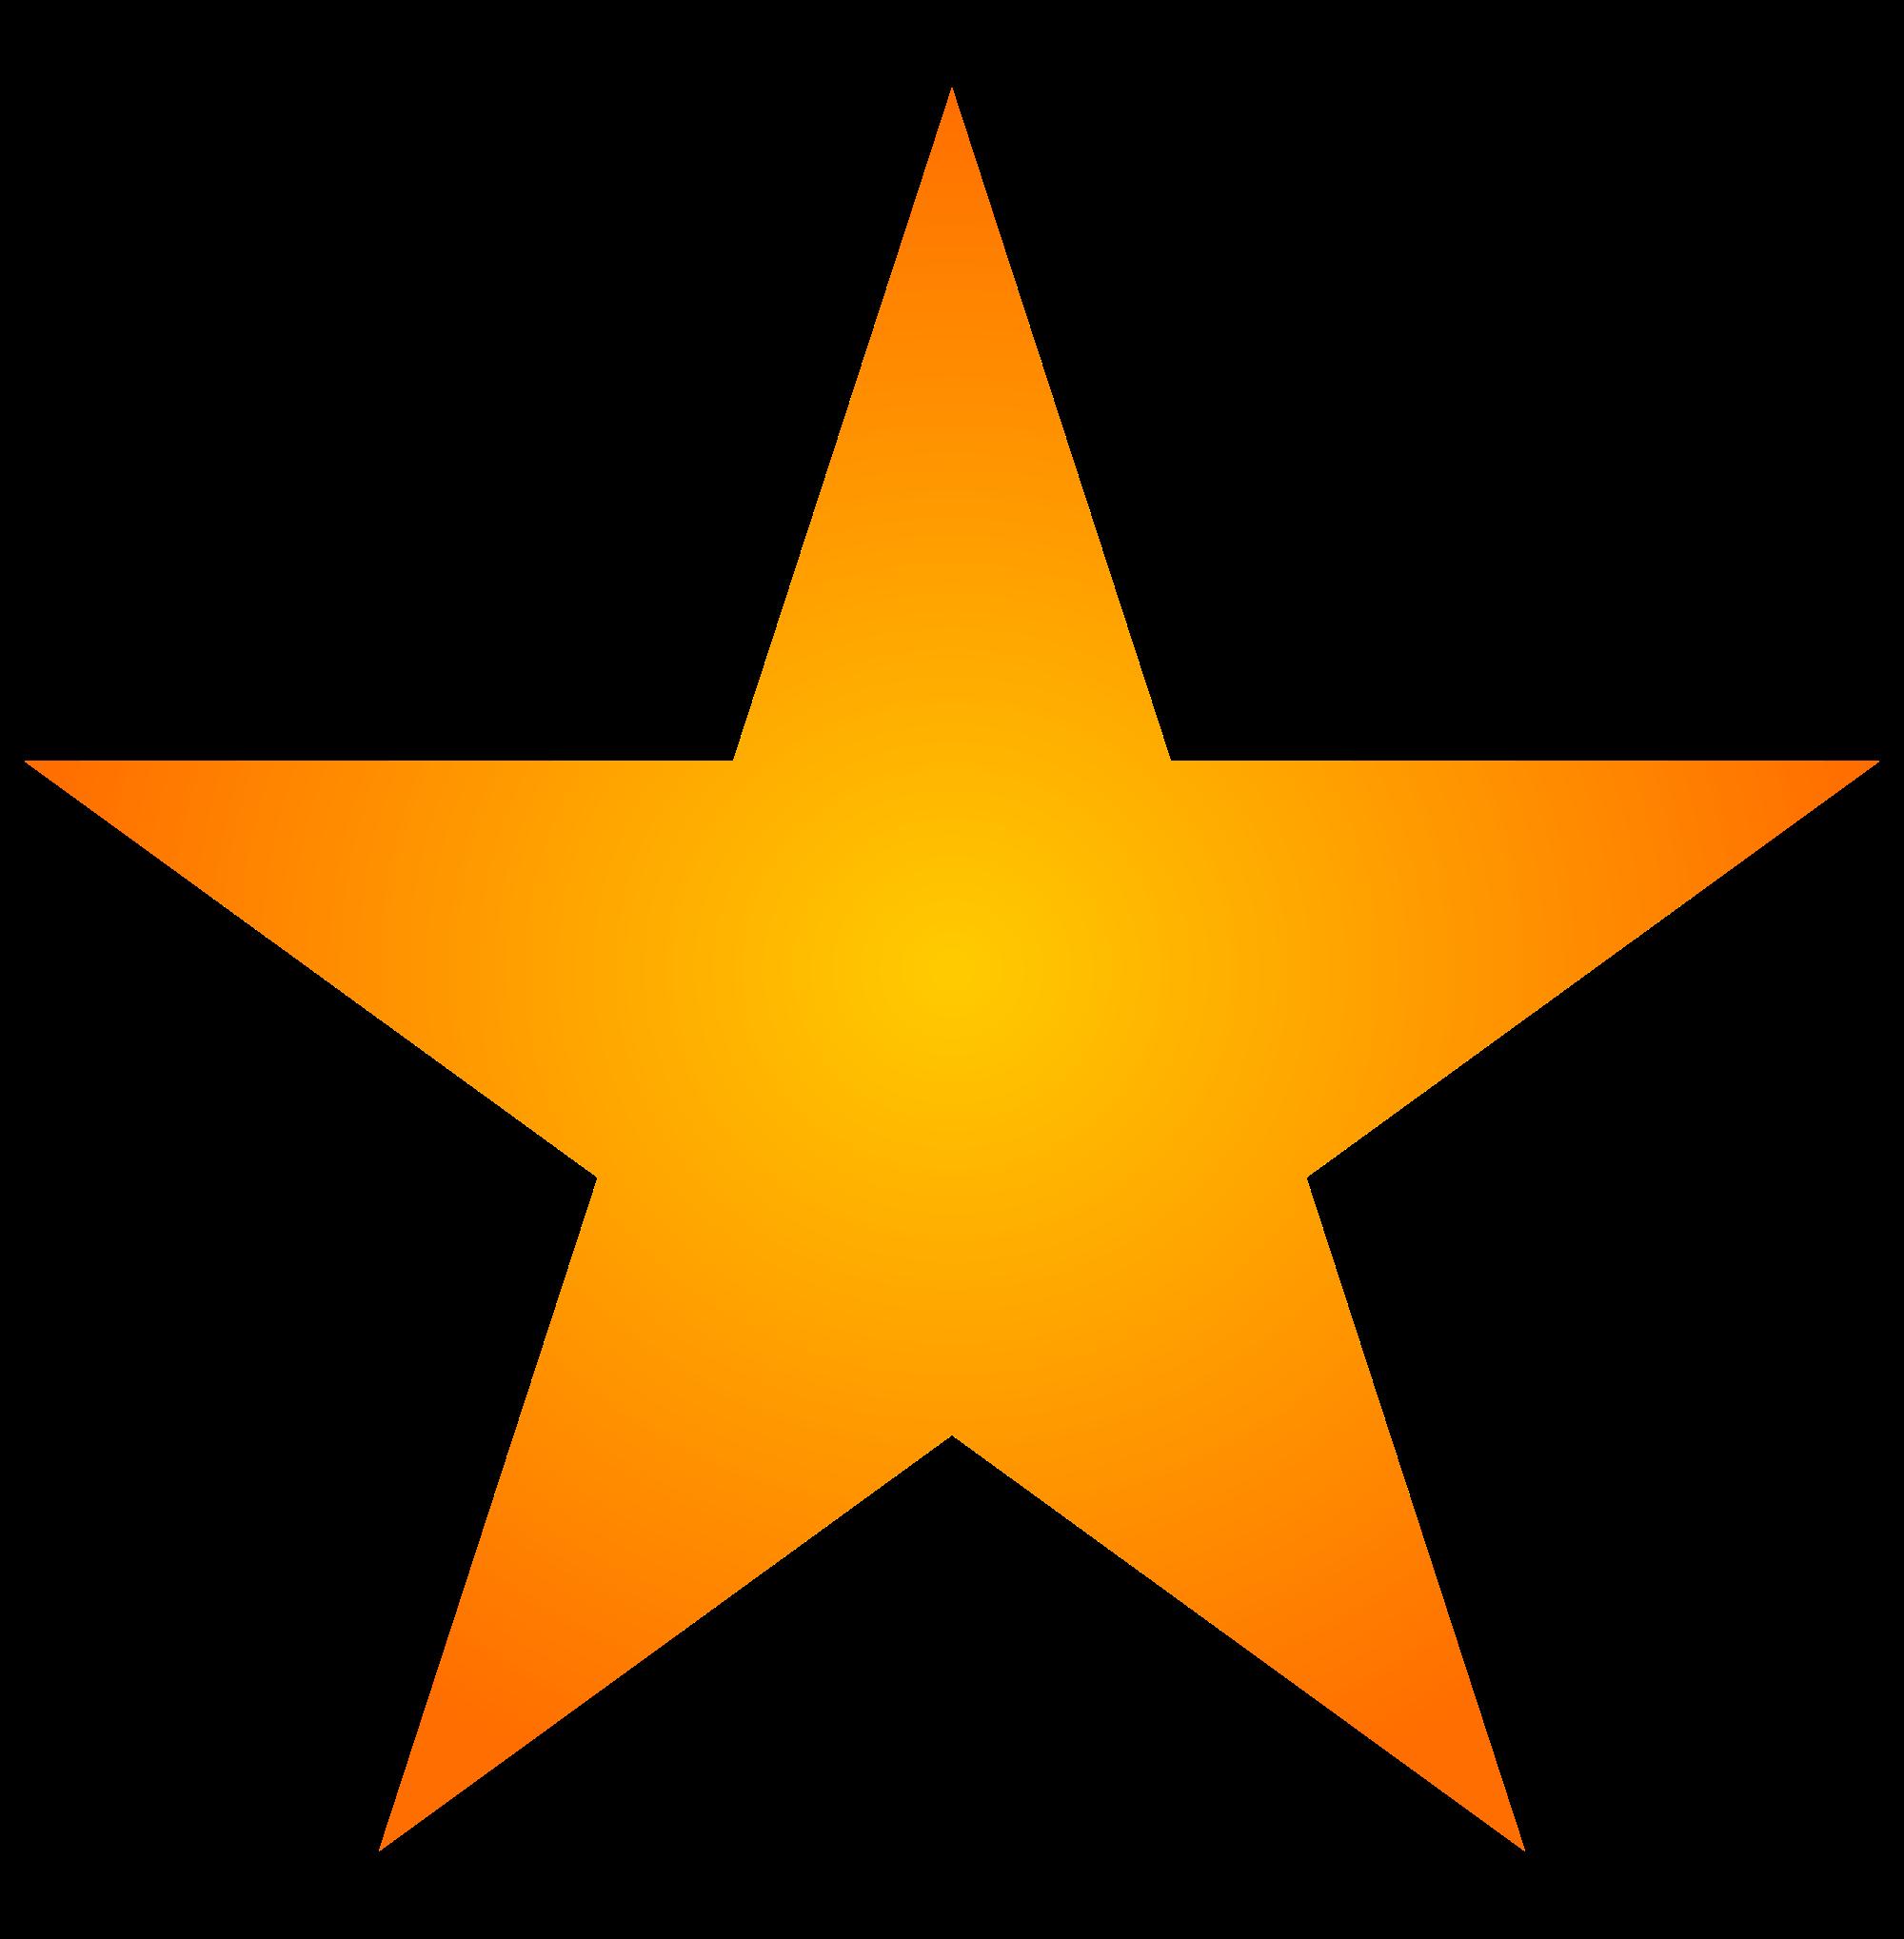 Download PNG image: star PNG image #612.